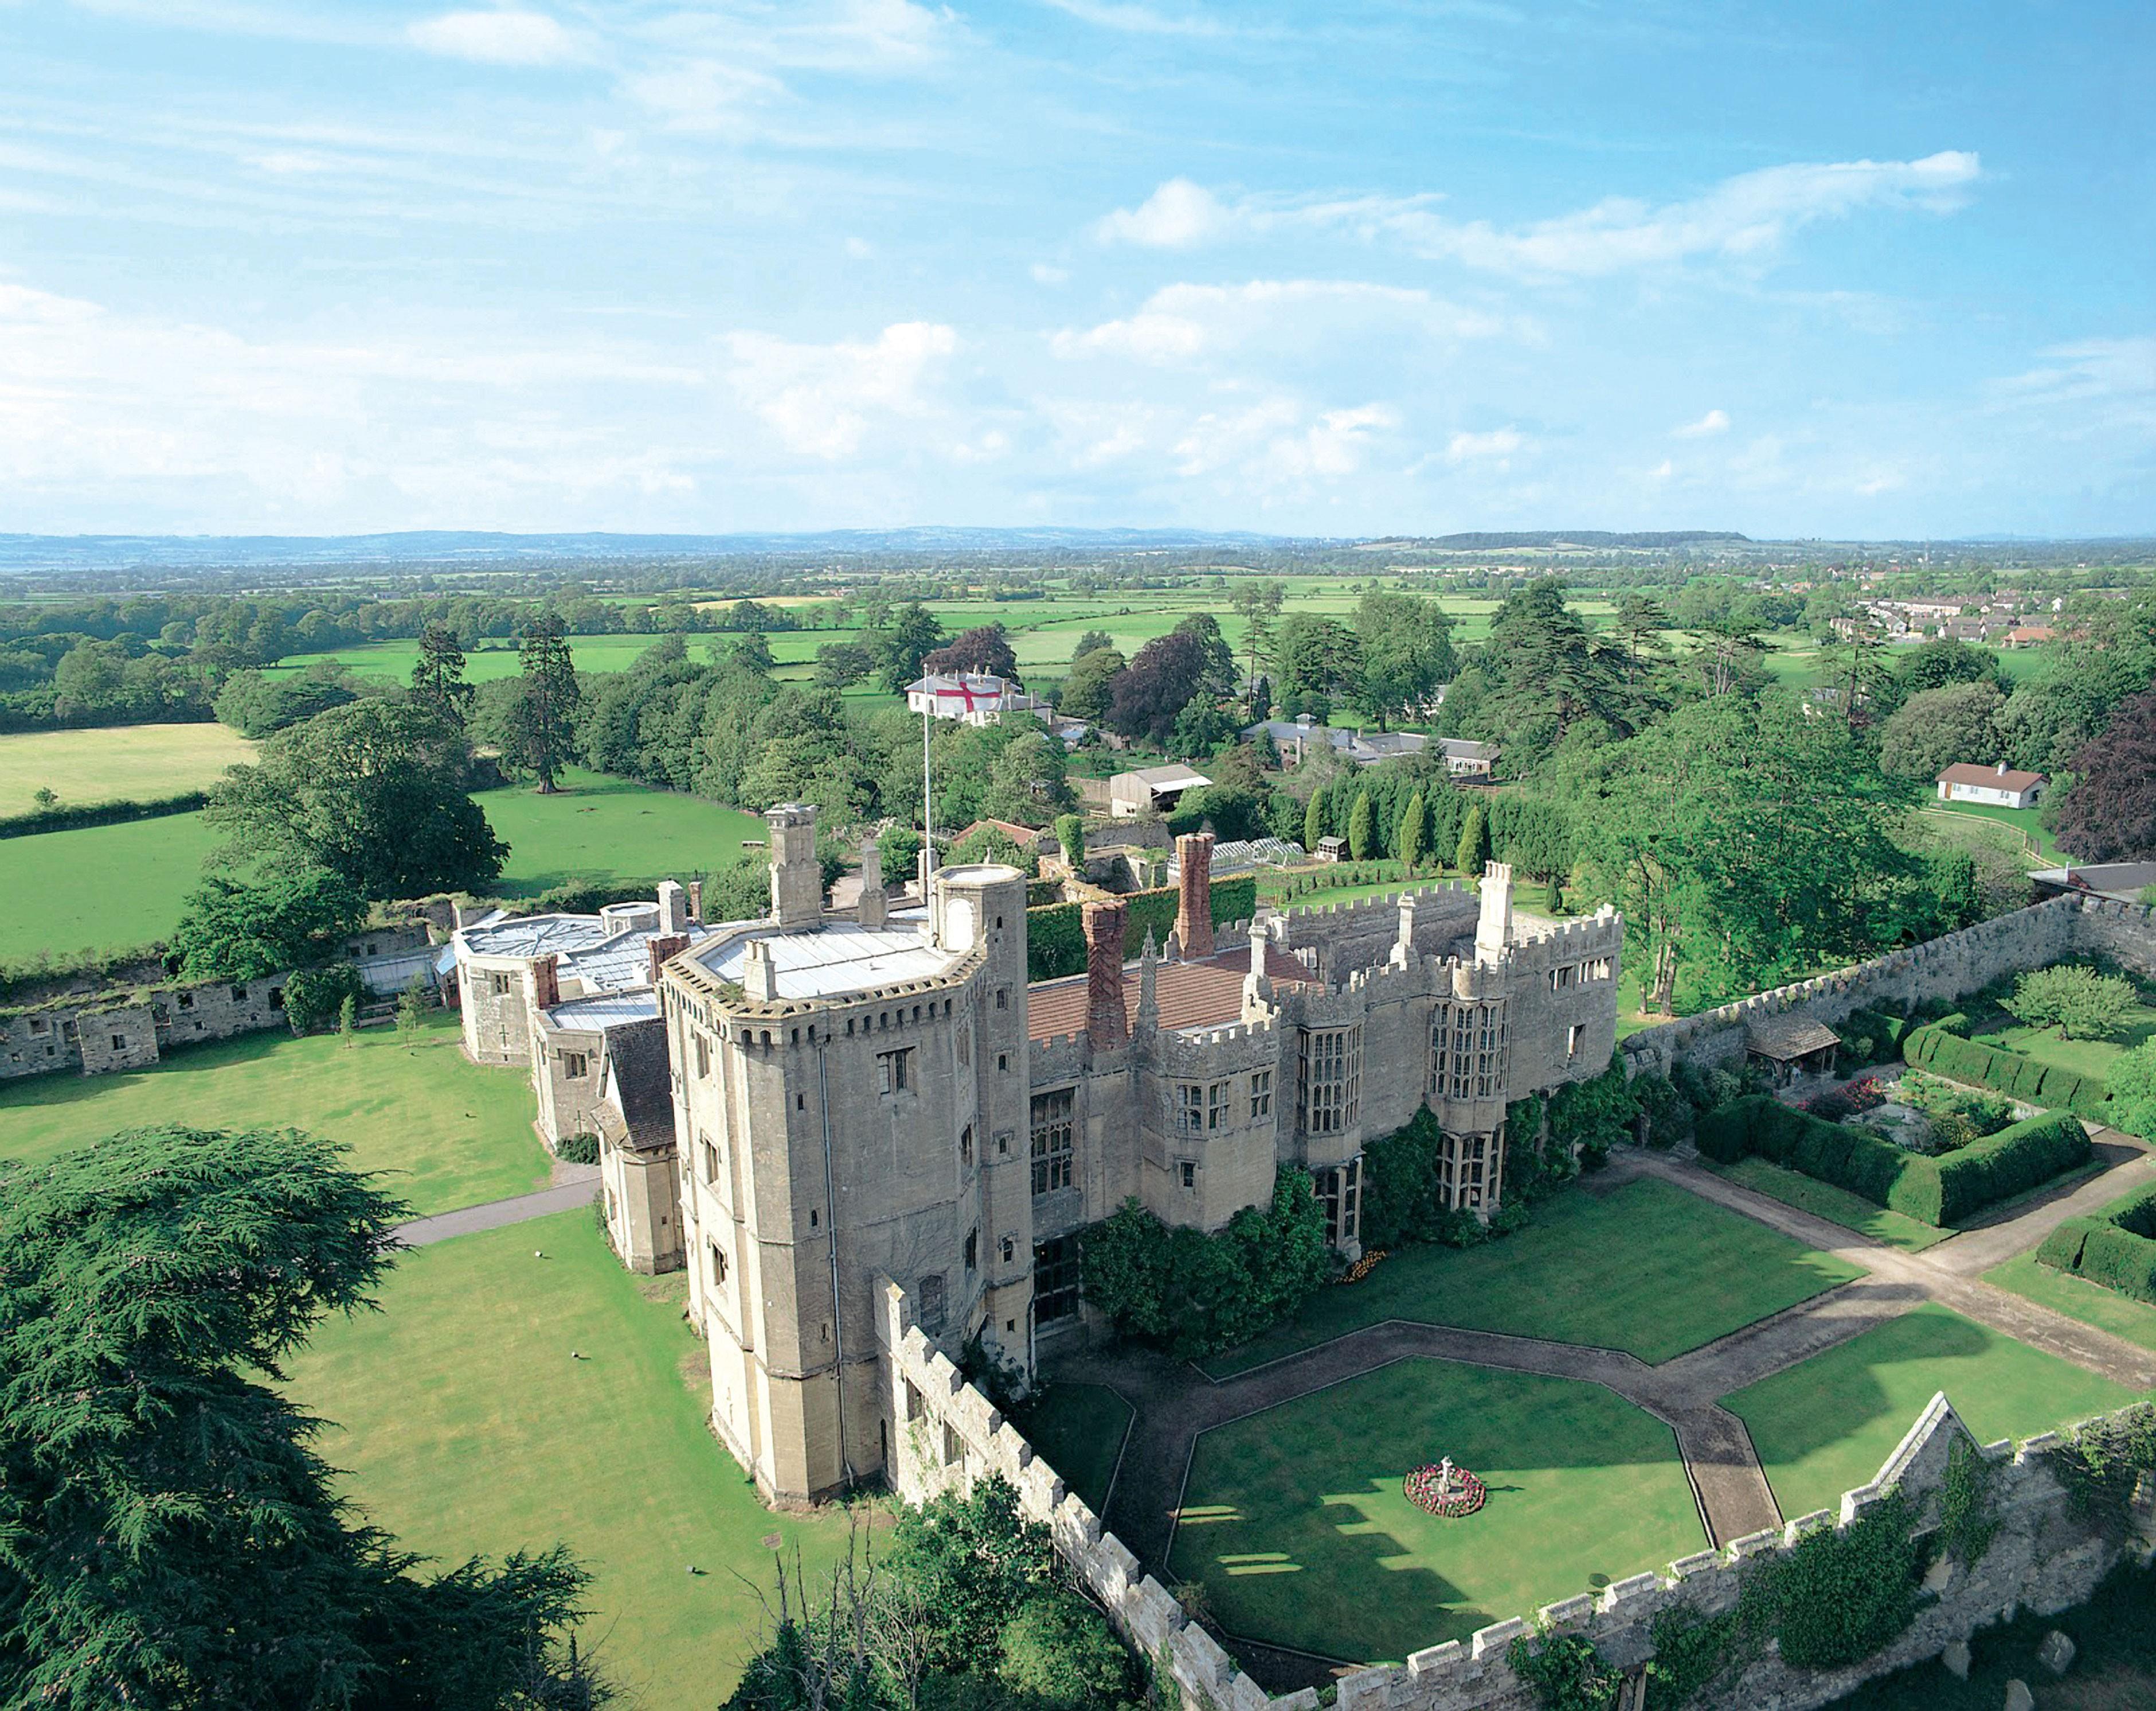 thornbury-castle-28-2